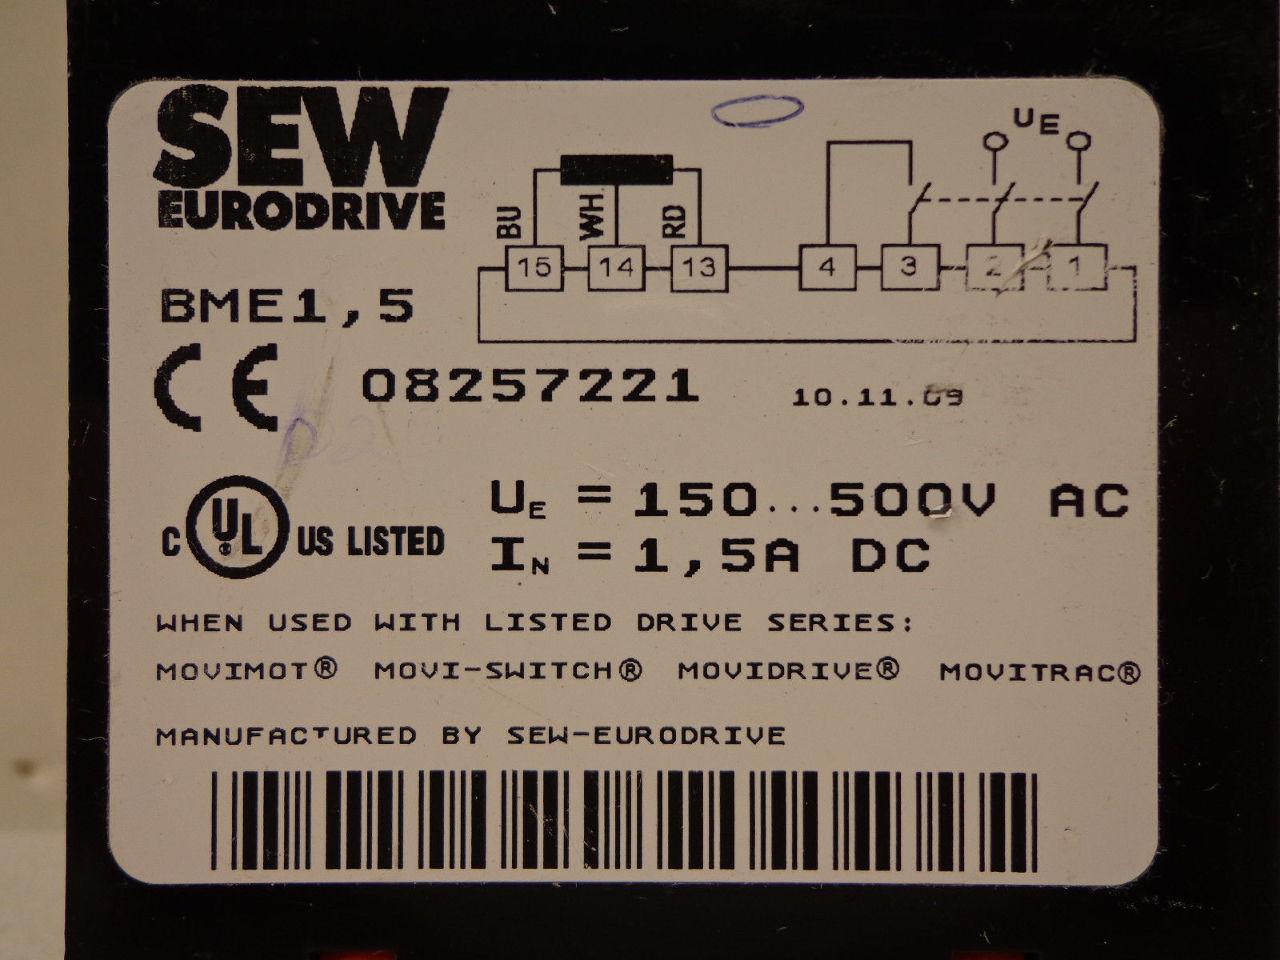 sew eurodrive wiring diagram 12 lead wire data schema u2022 rh kiymik co sew eurodrive motor brake wiring diagram sew motor brake wiring diagram